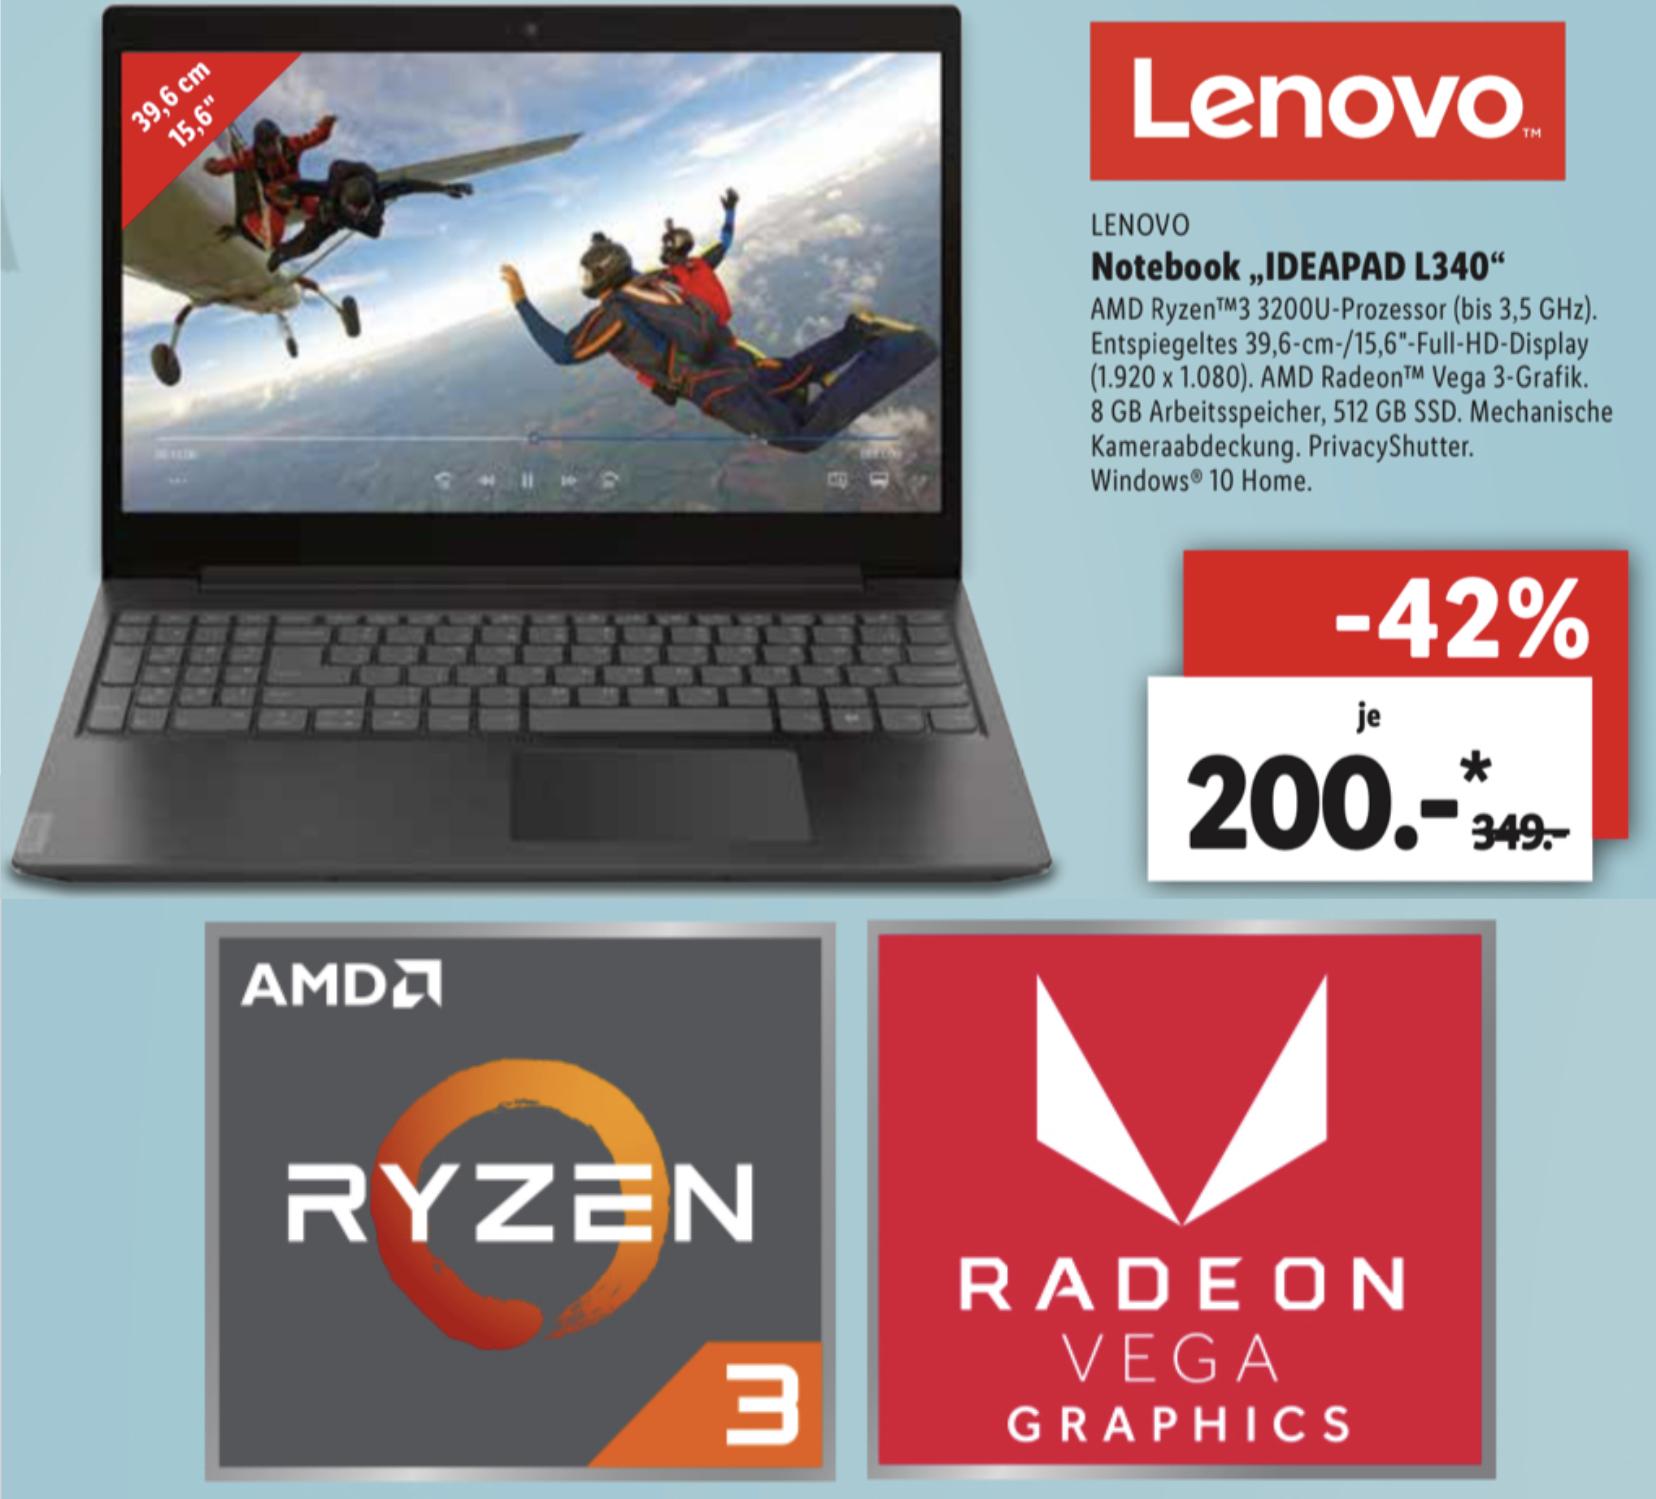 Lokal Lidl Bruchköbel: Lenovo IDEAPAD L340 Ryzen 3 3200U 512GB SSD Radeon Vega für 200€ / HP Pavillon x360 2in1 512GB SSD + Stift für 250€